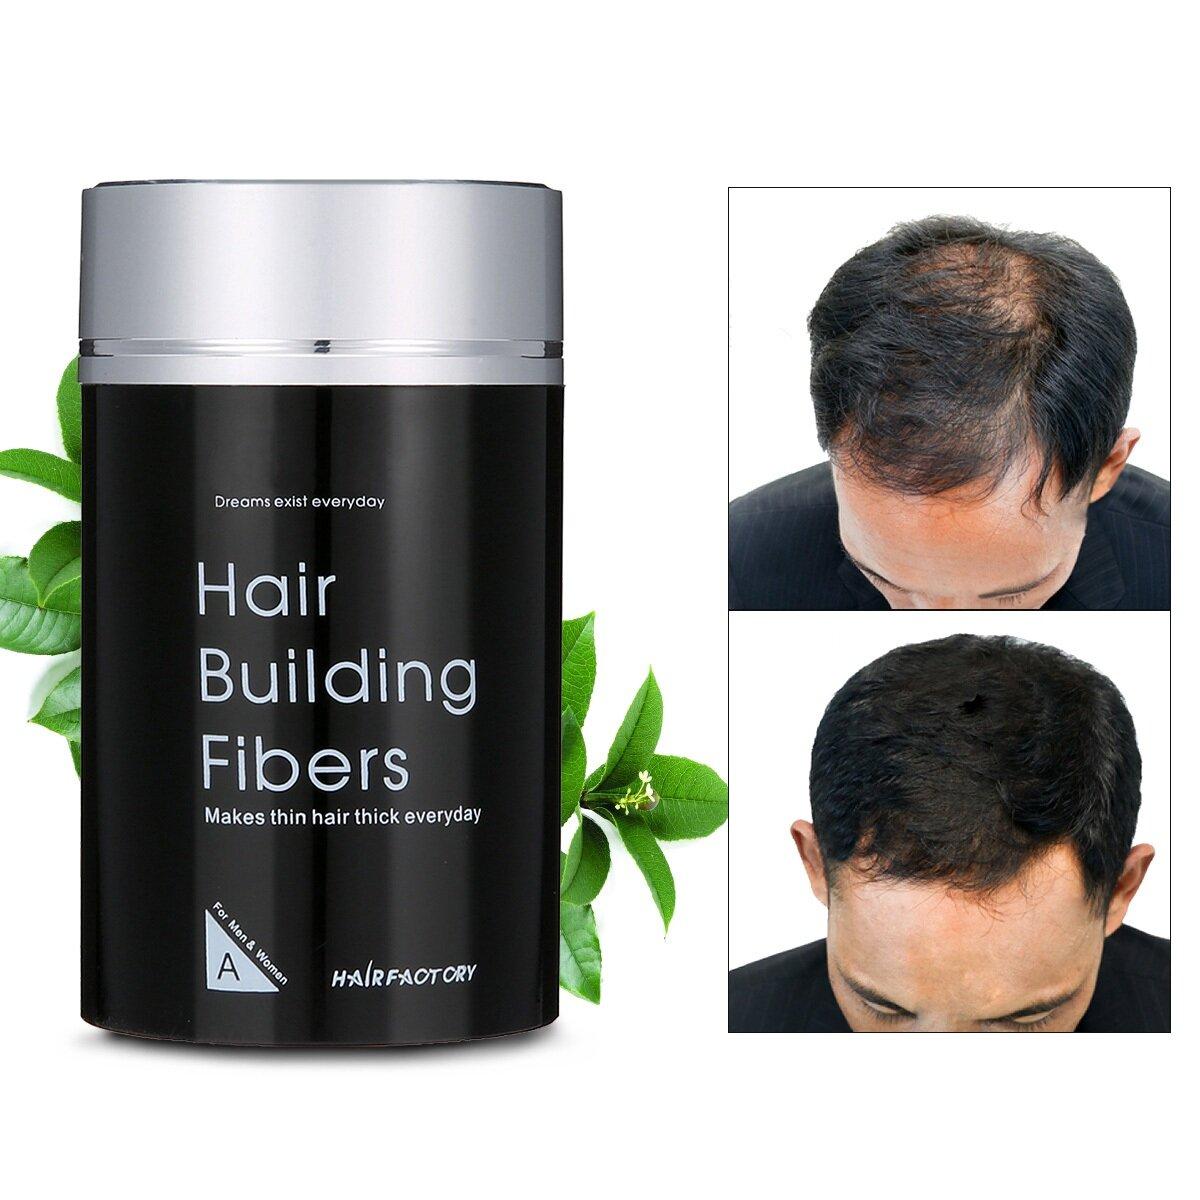 DEXE 22g Hair Building Fibers Black Makes Hair Thick